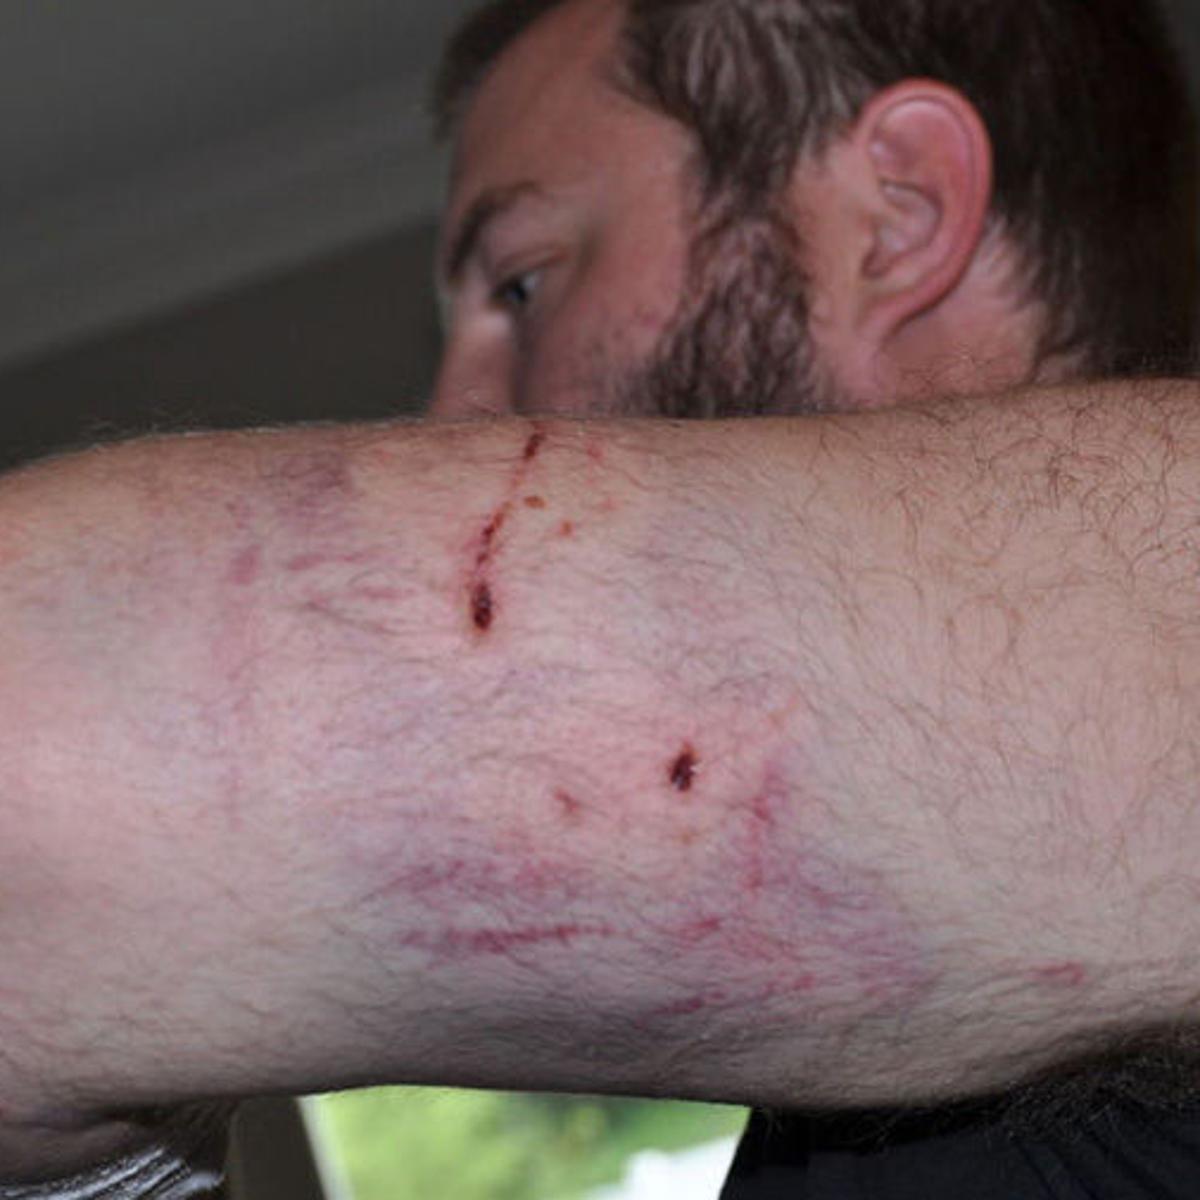 Bobcat, not bear or mountain lion, culprit in attack near